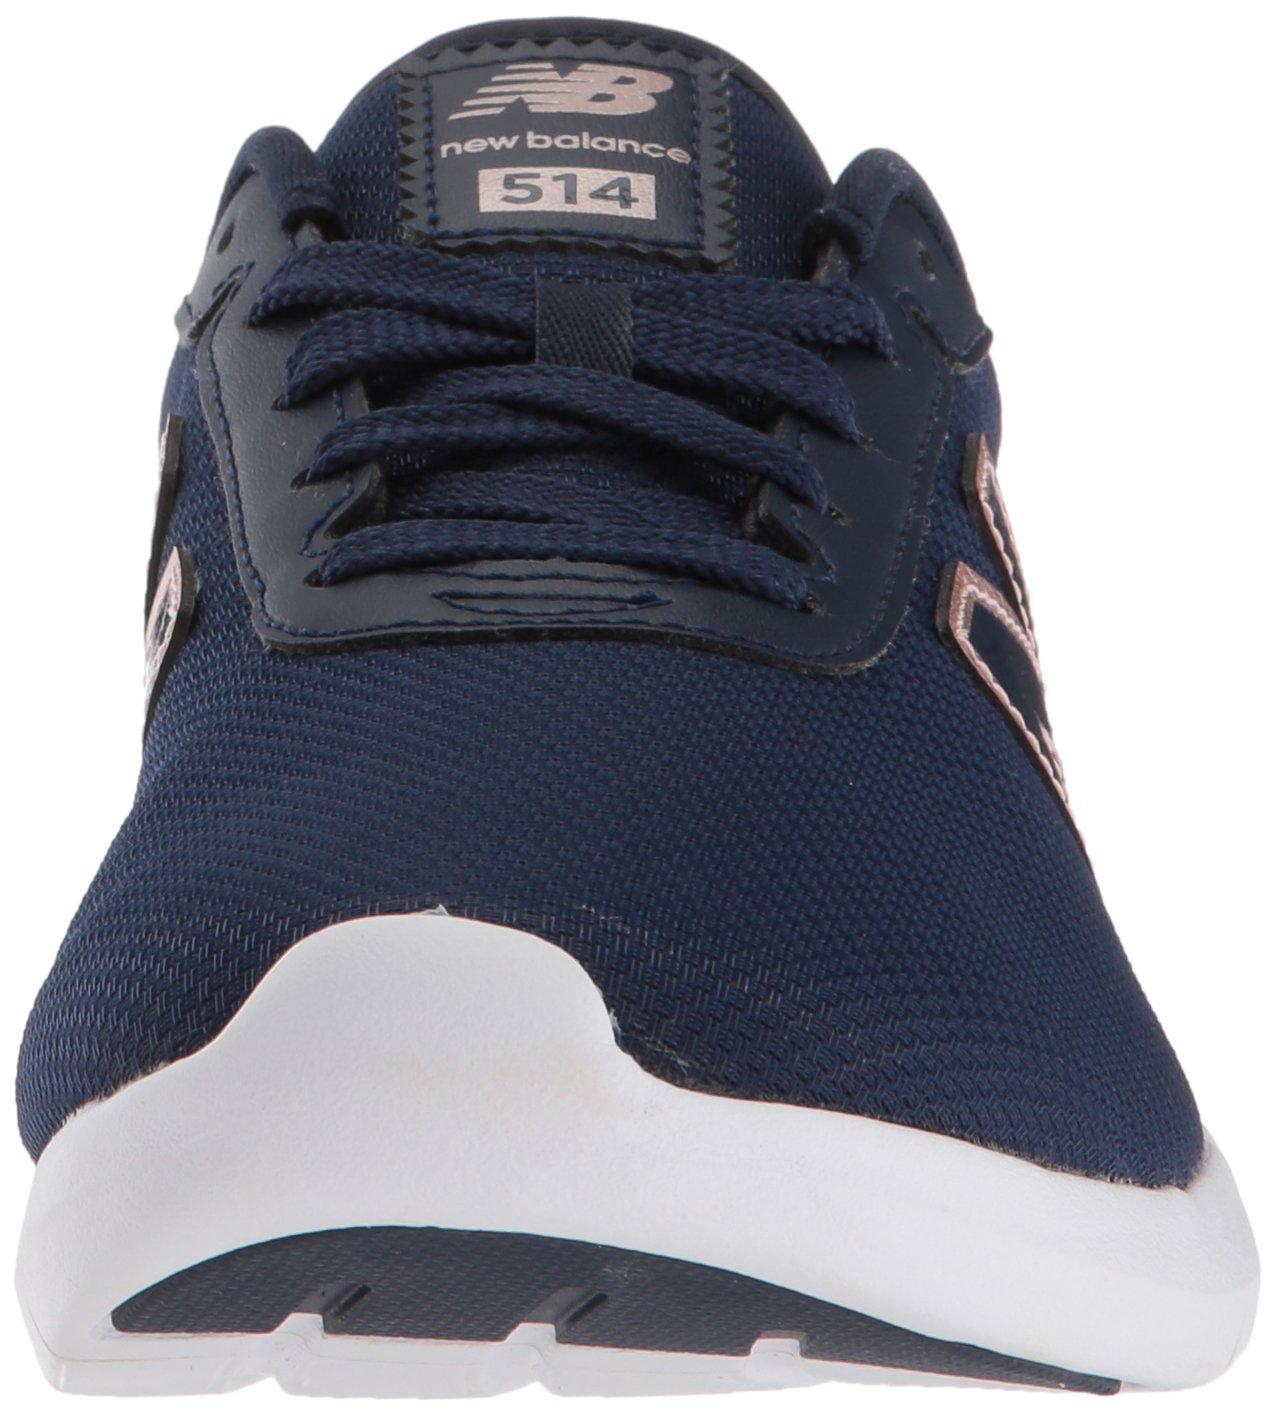 New Balance Women's 514V1 US Pigment/Champagne Sneaker B06XSBW6ZC 12 D US Pigment/Champagne 514V1 Metallic a6c61d